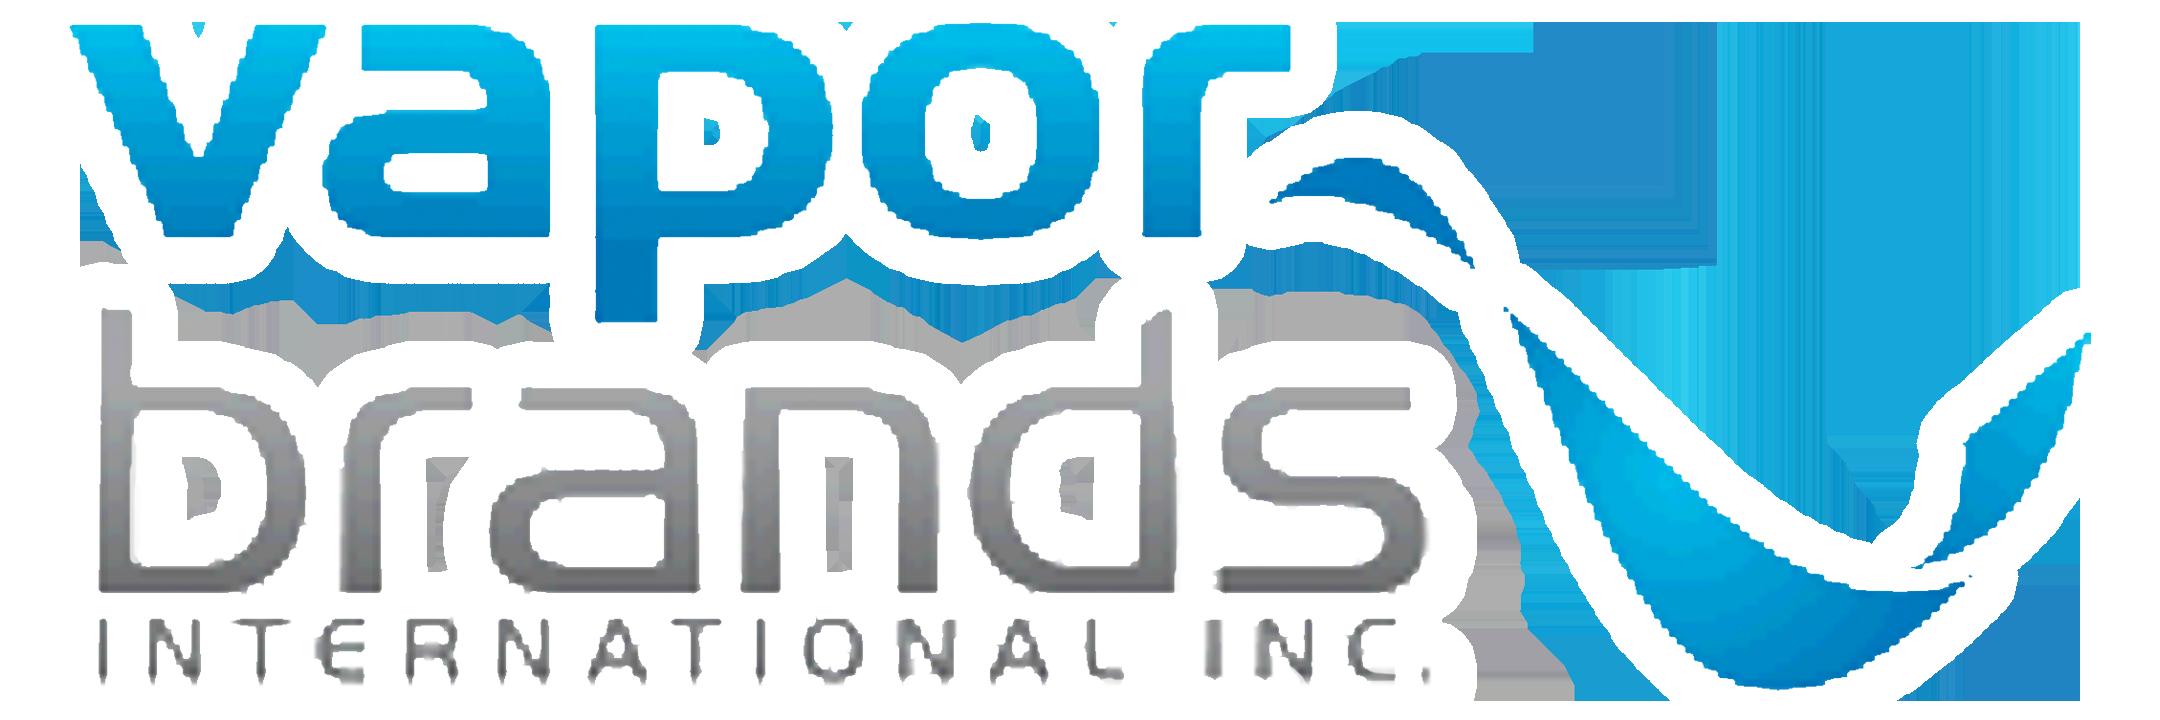 VaporBrands International Inc. (OTC:VAPR)